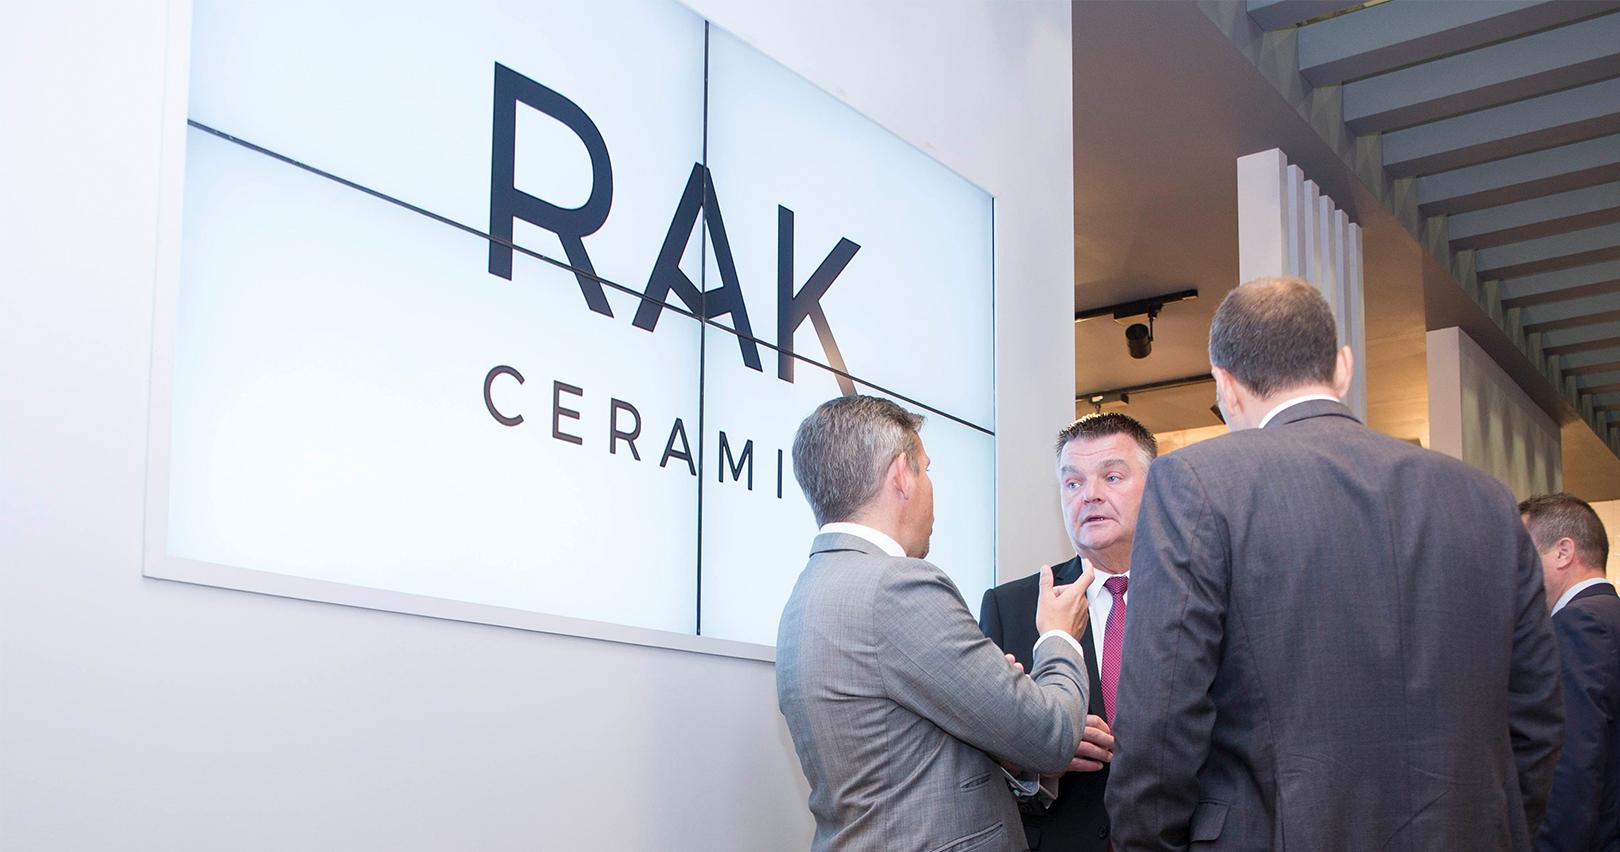 RAK Ceramics Participates in EFG Hermes 'London MENA Conference'